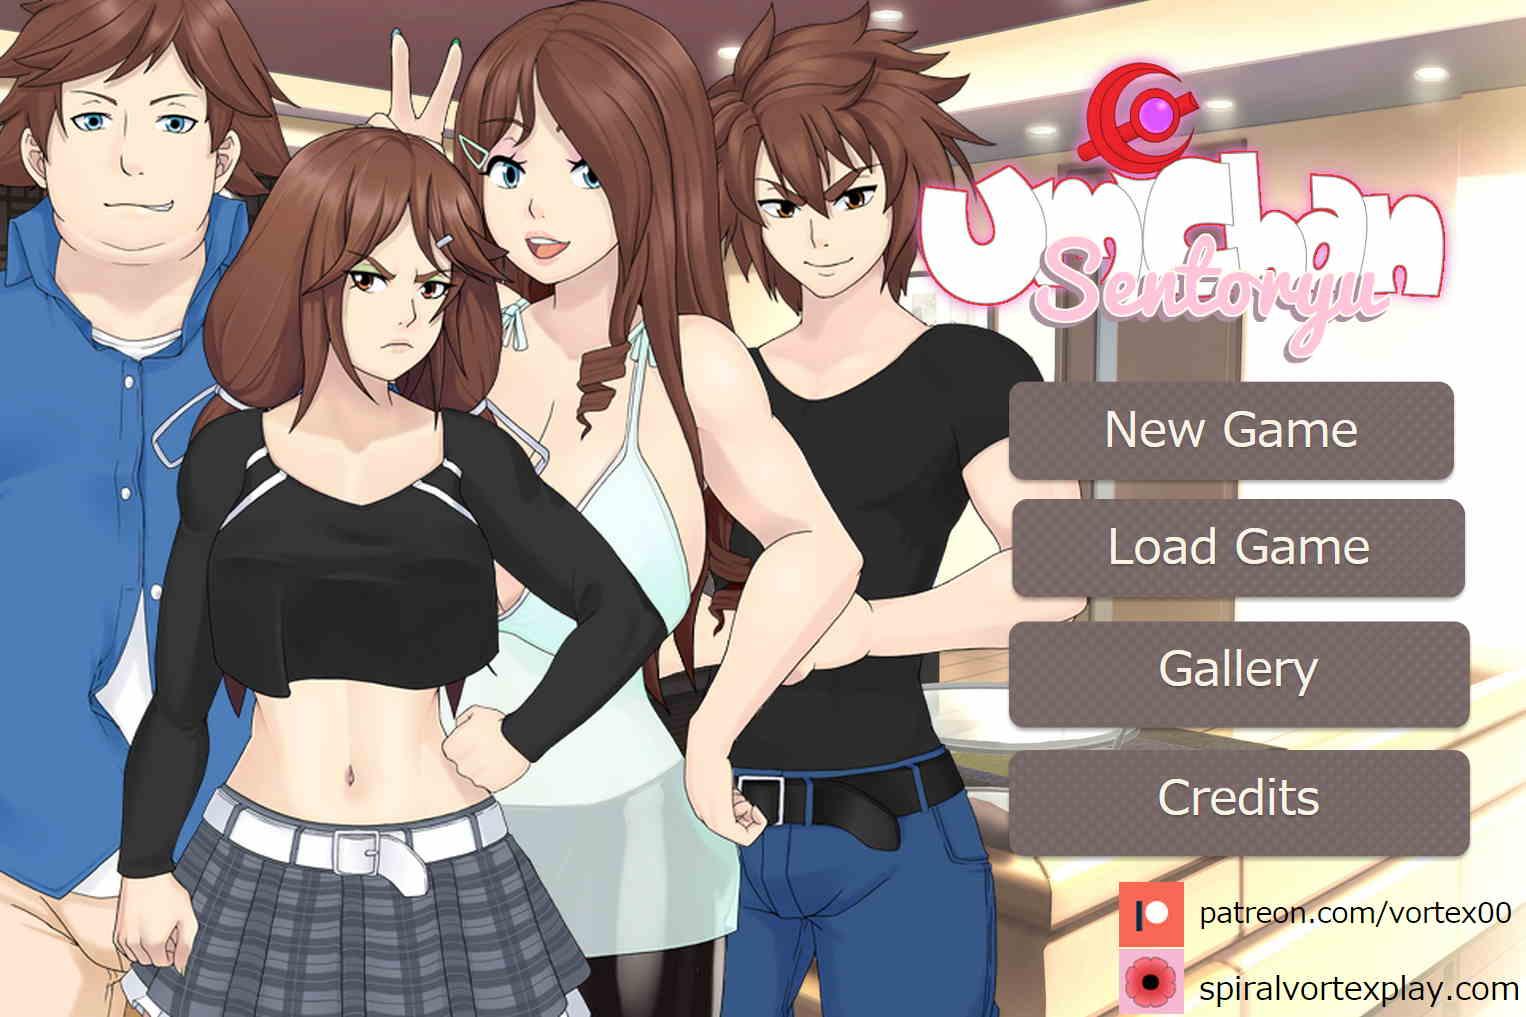 [Others] Umichan Sentoryu - v0.8.1 18+ Adult xxx Porn Game